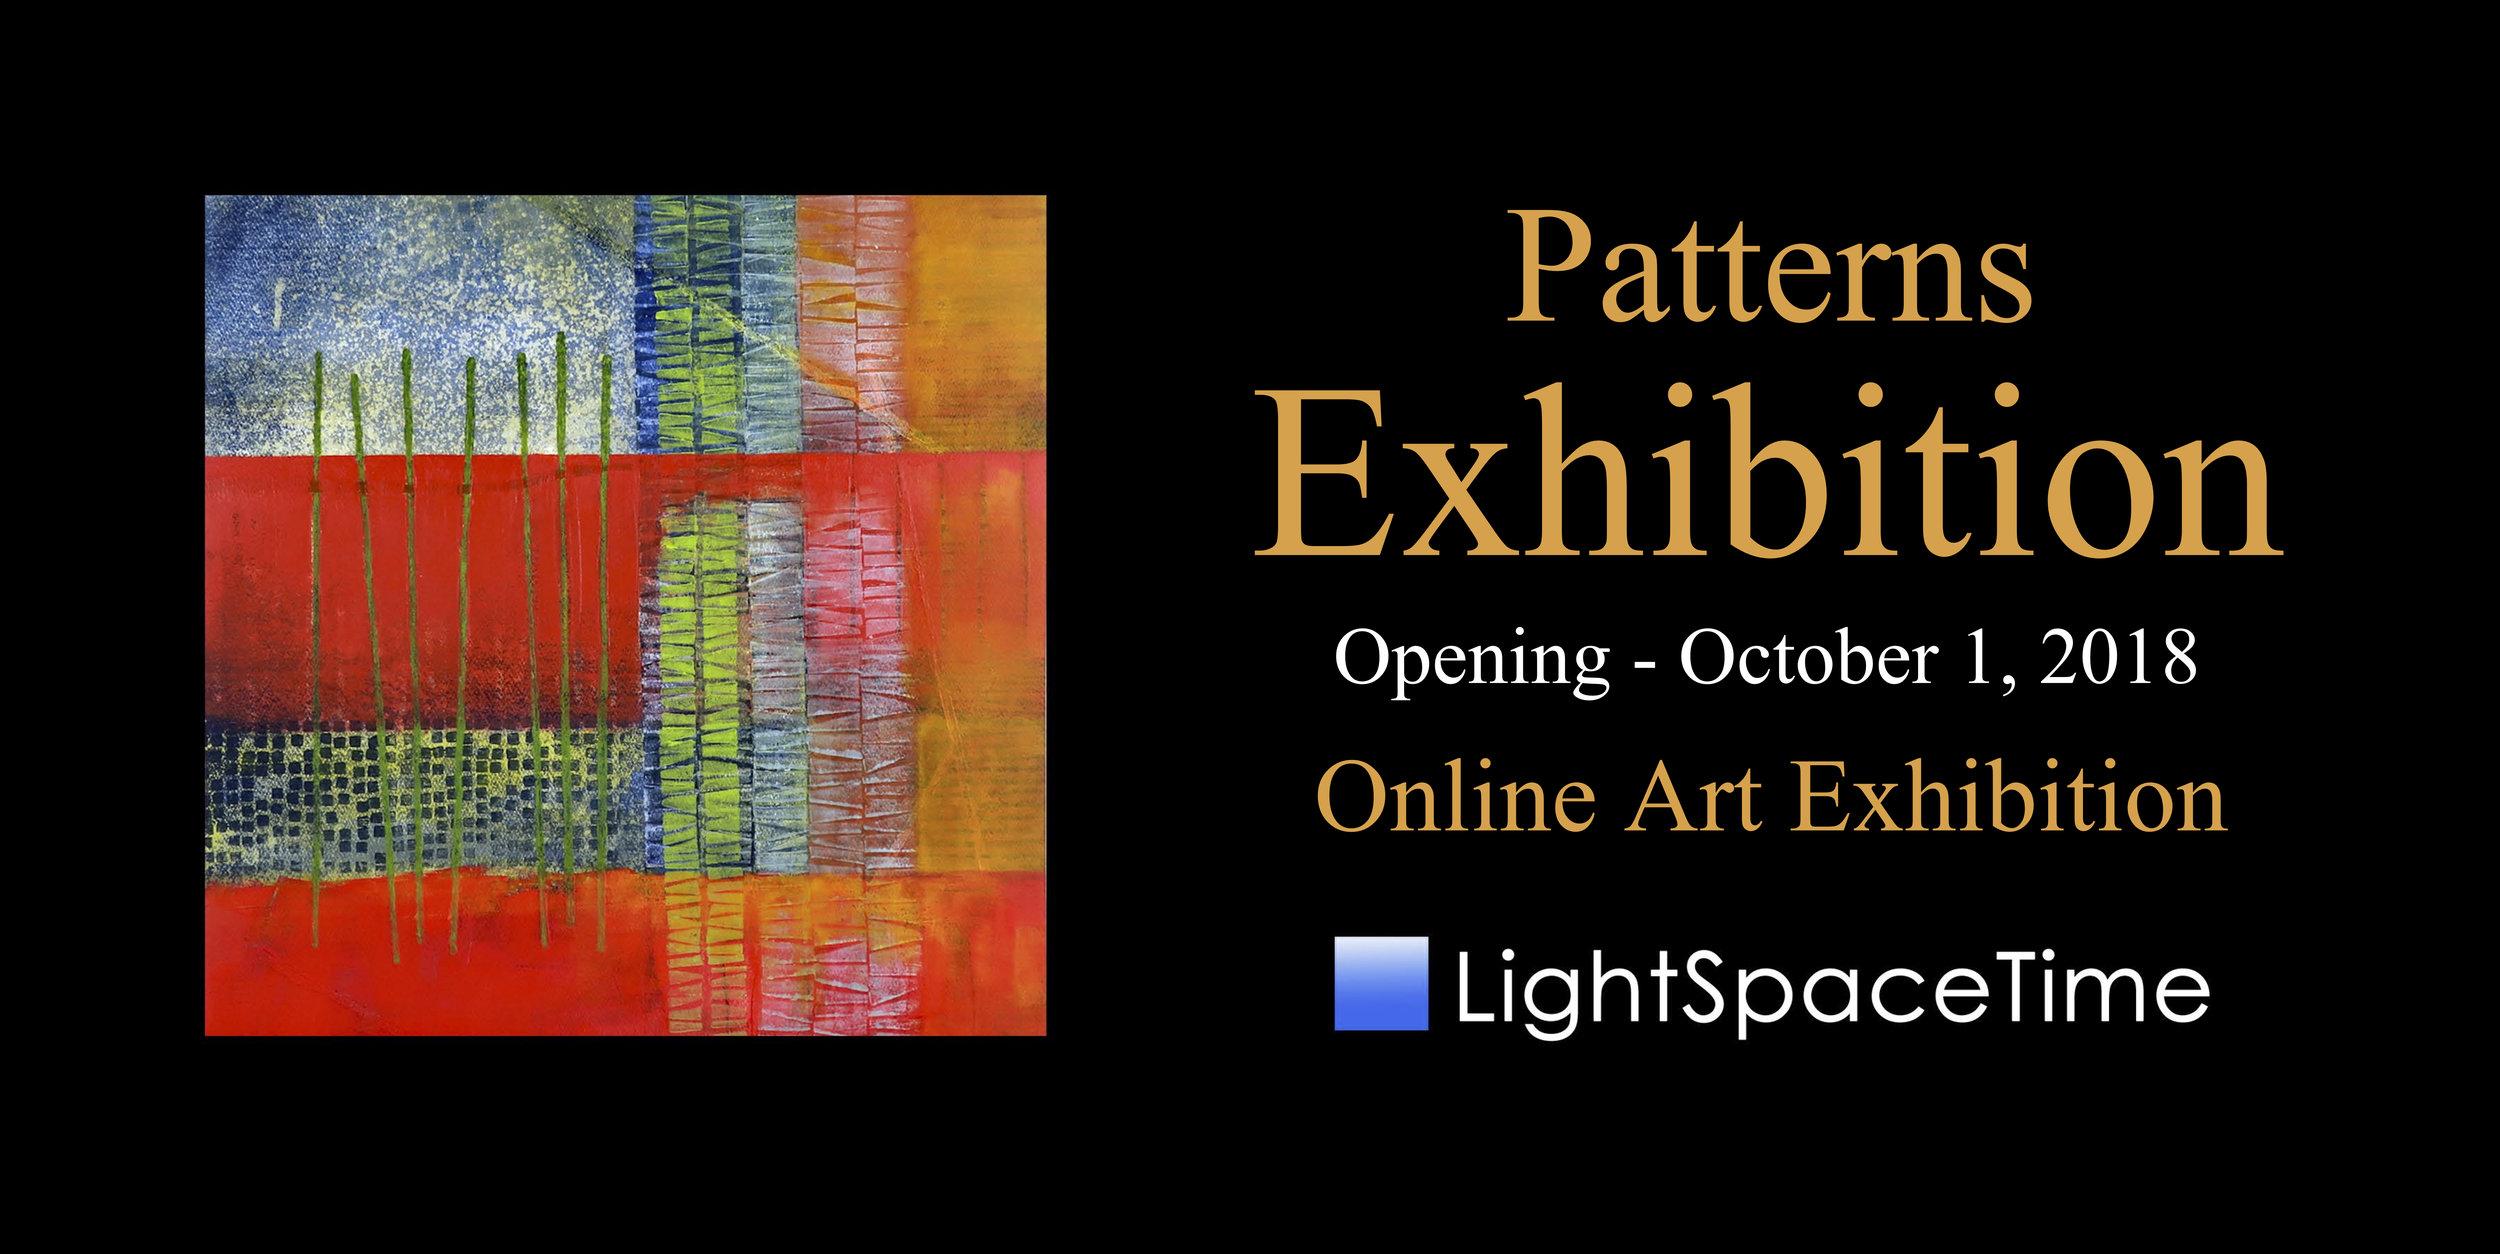 PATTERNS 2018  ART EXHIBITION -  EVENT POSTCARD.jpg